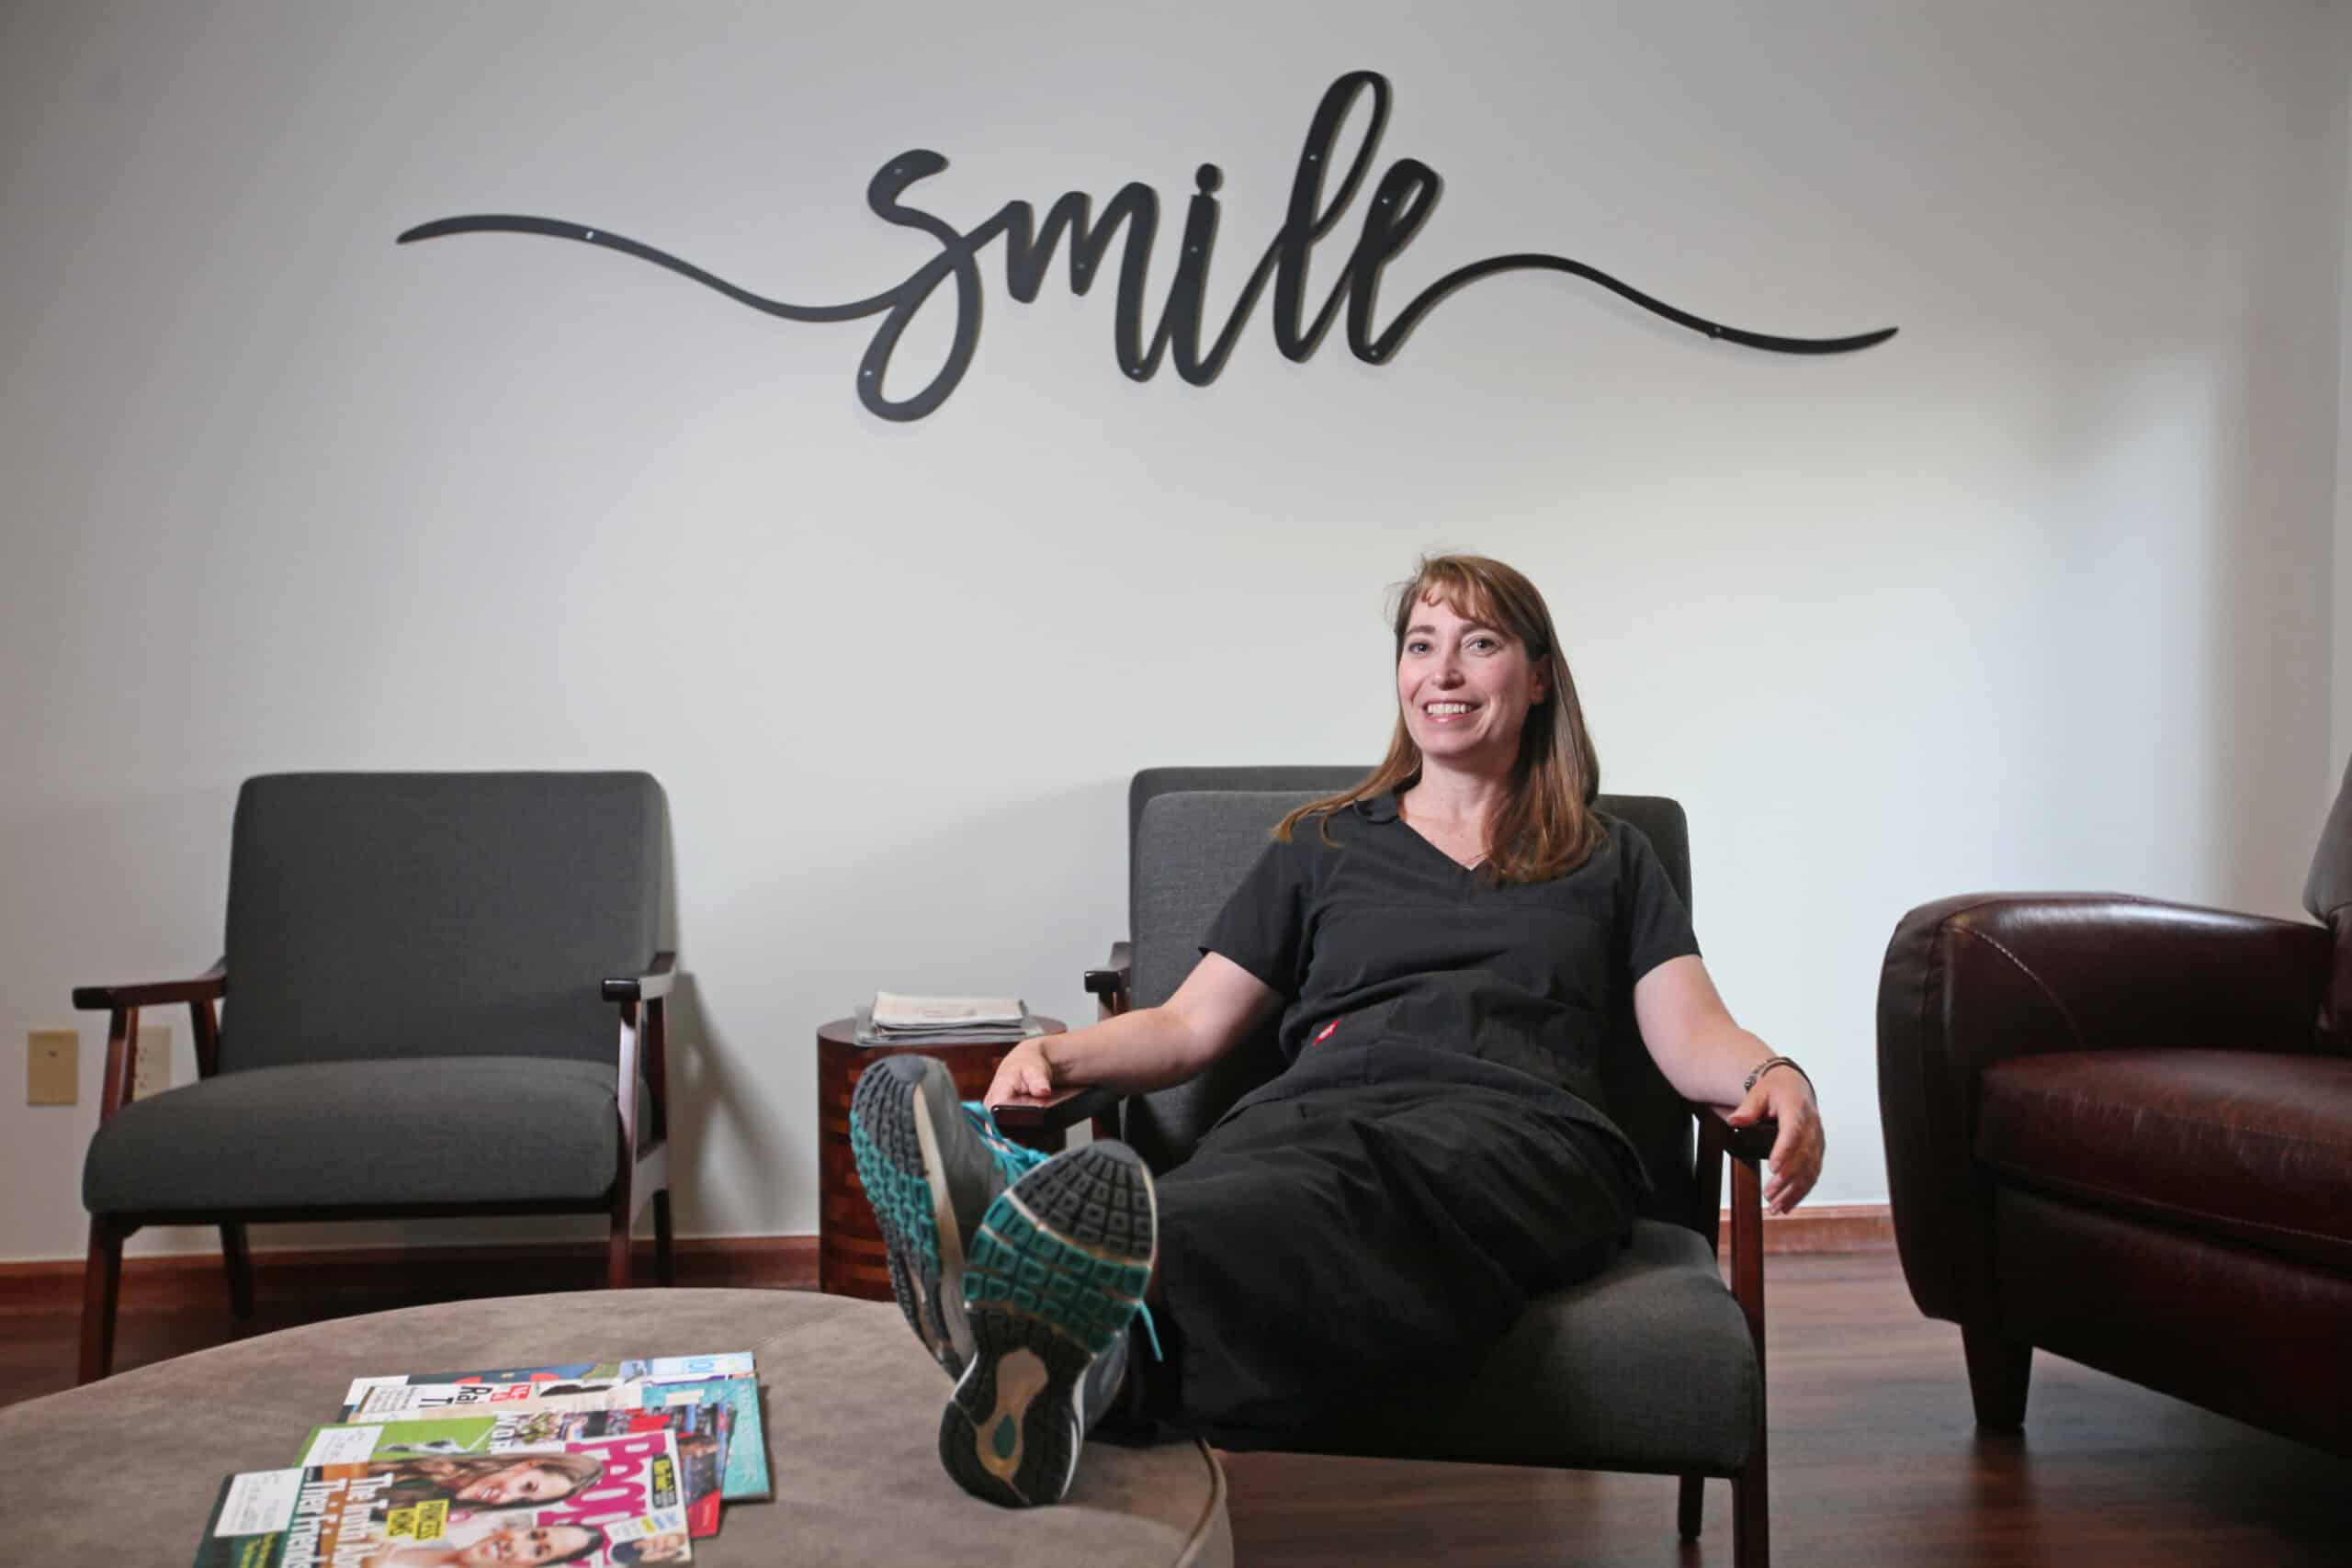 Dr. Small, DDS at Bennett Dublin Dental